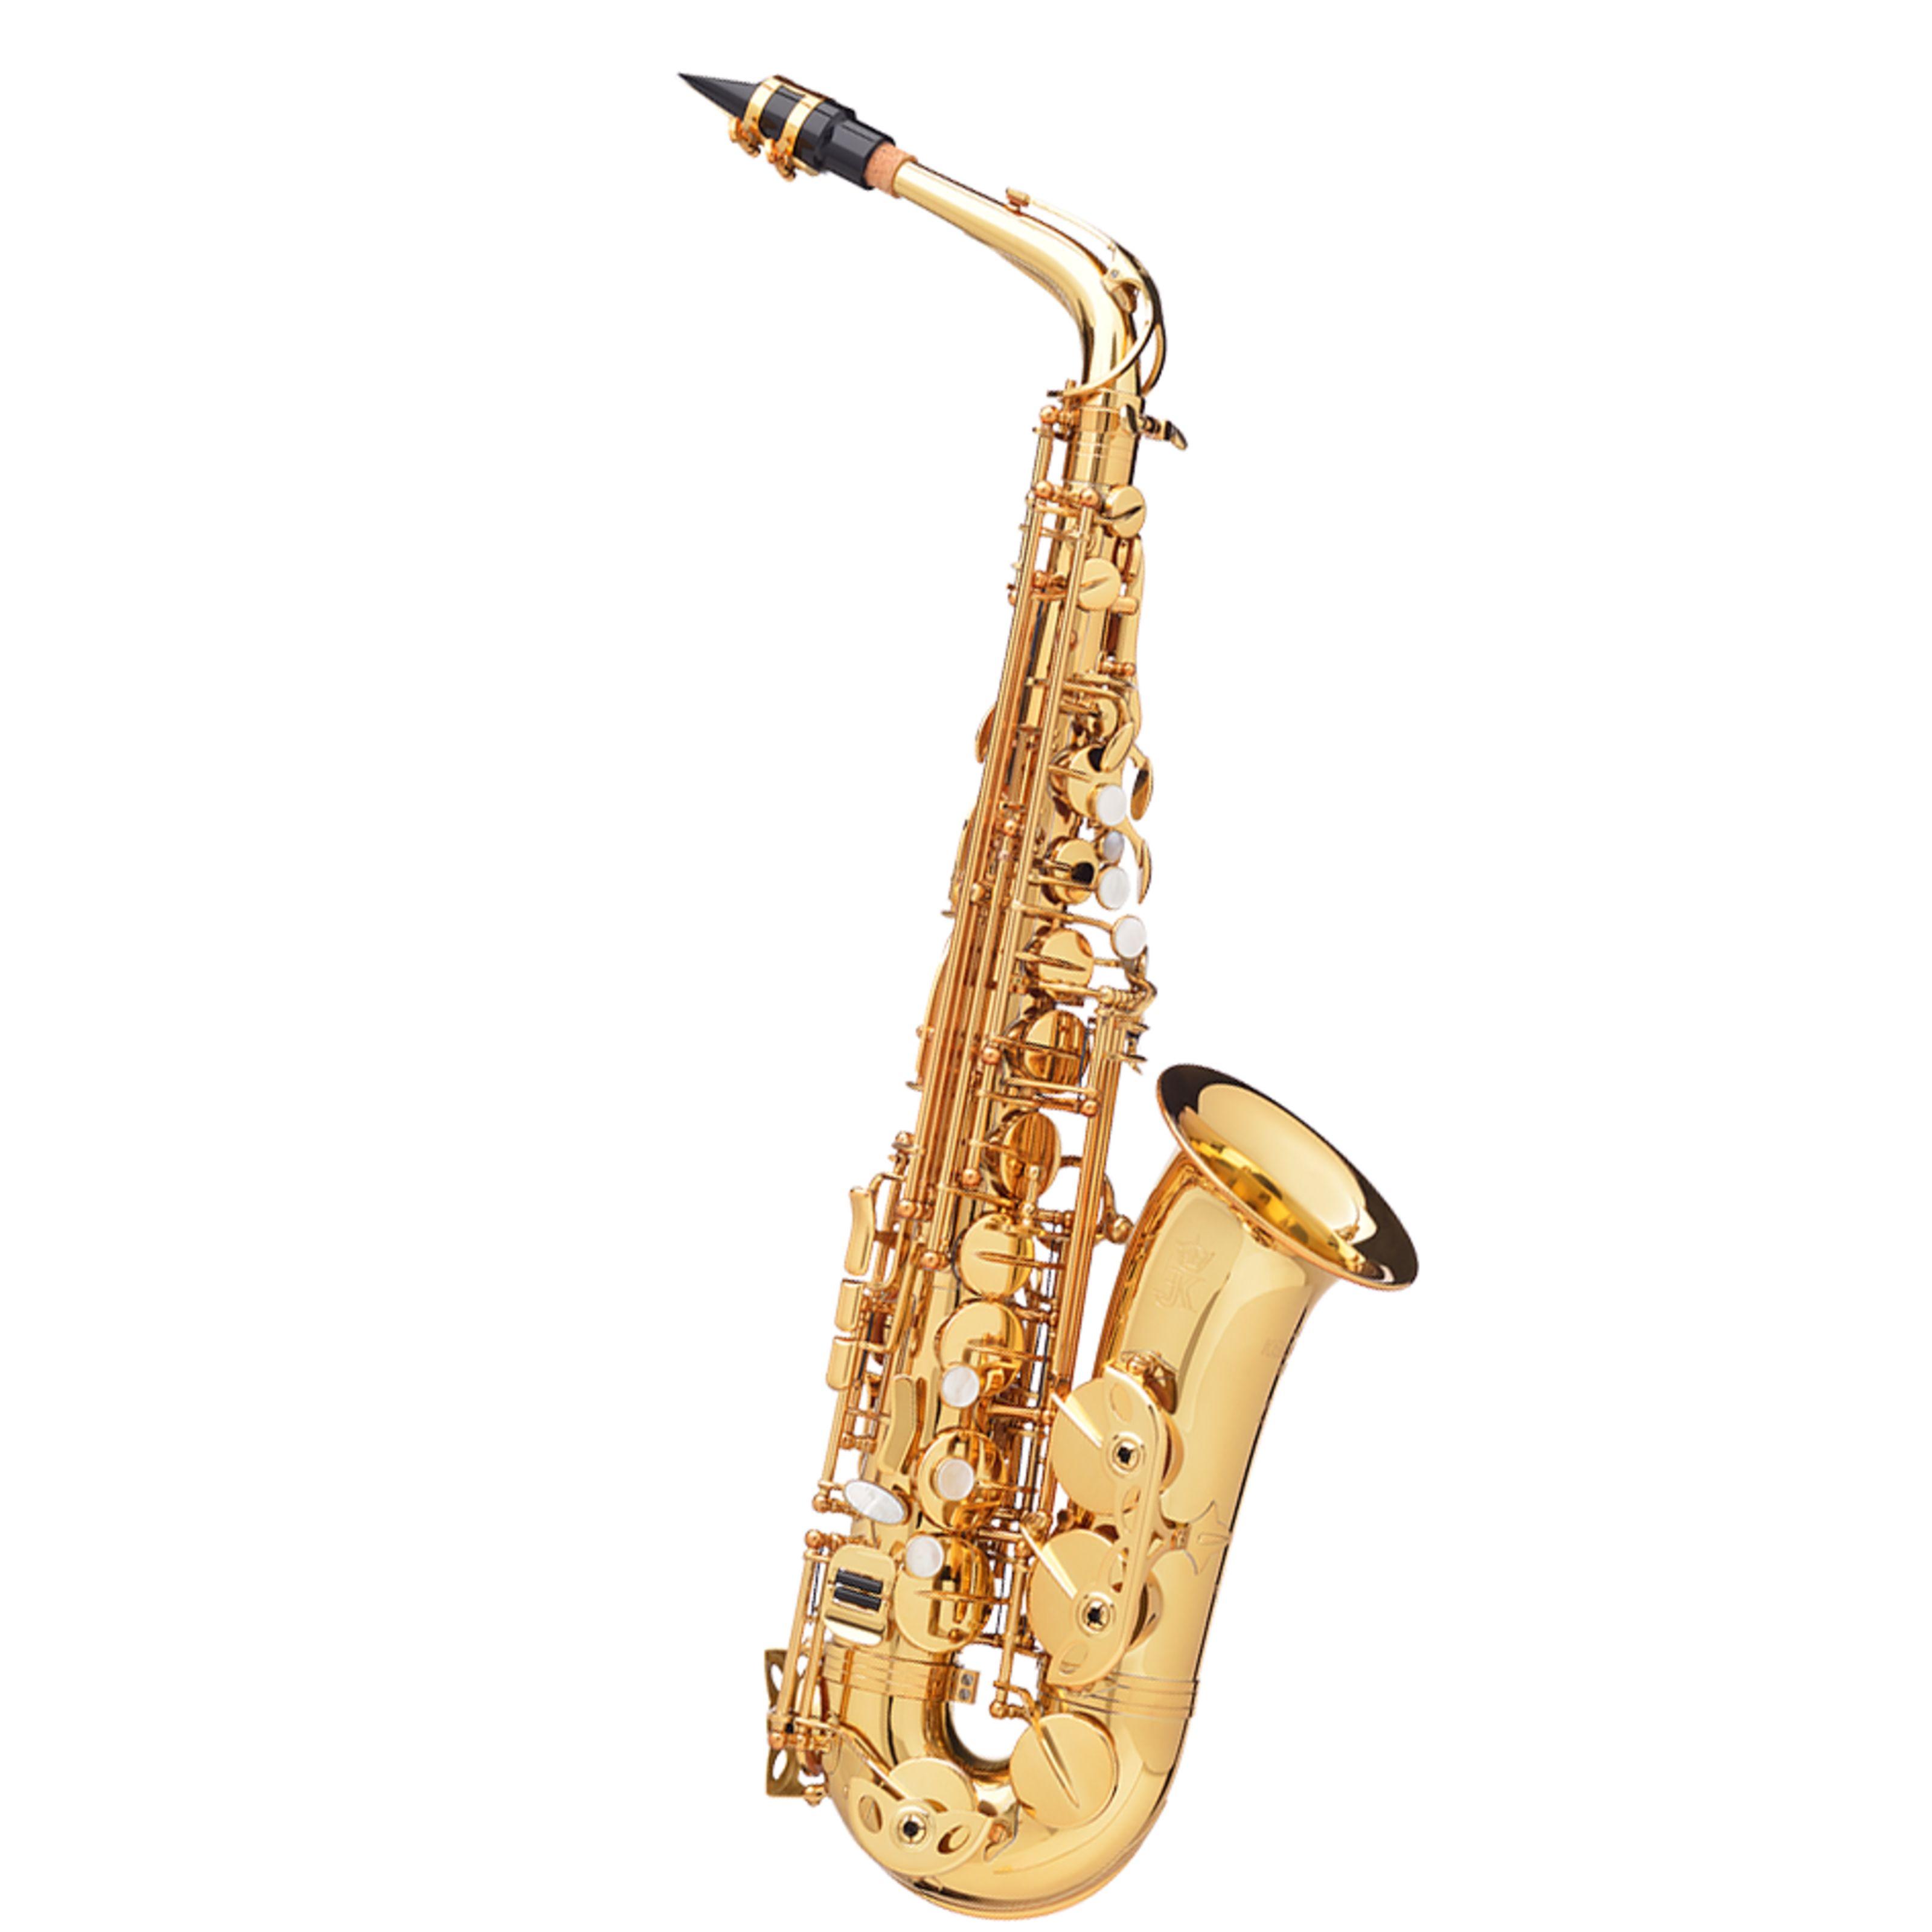 Keilwerth - ST-110 Alt Saxophon JK2103-8-0